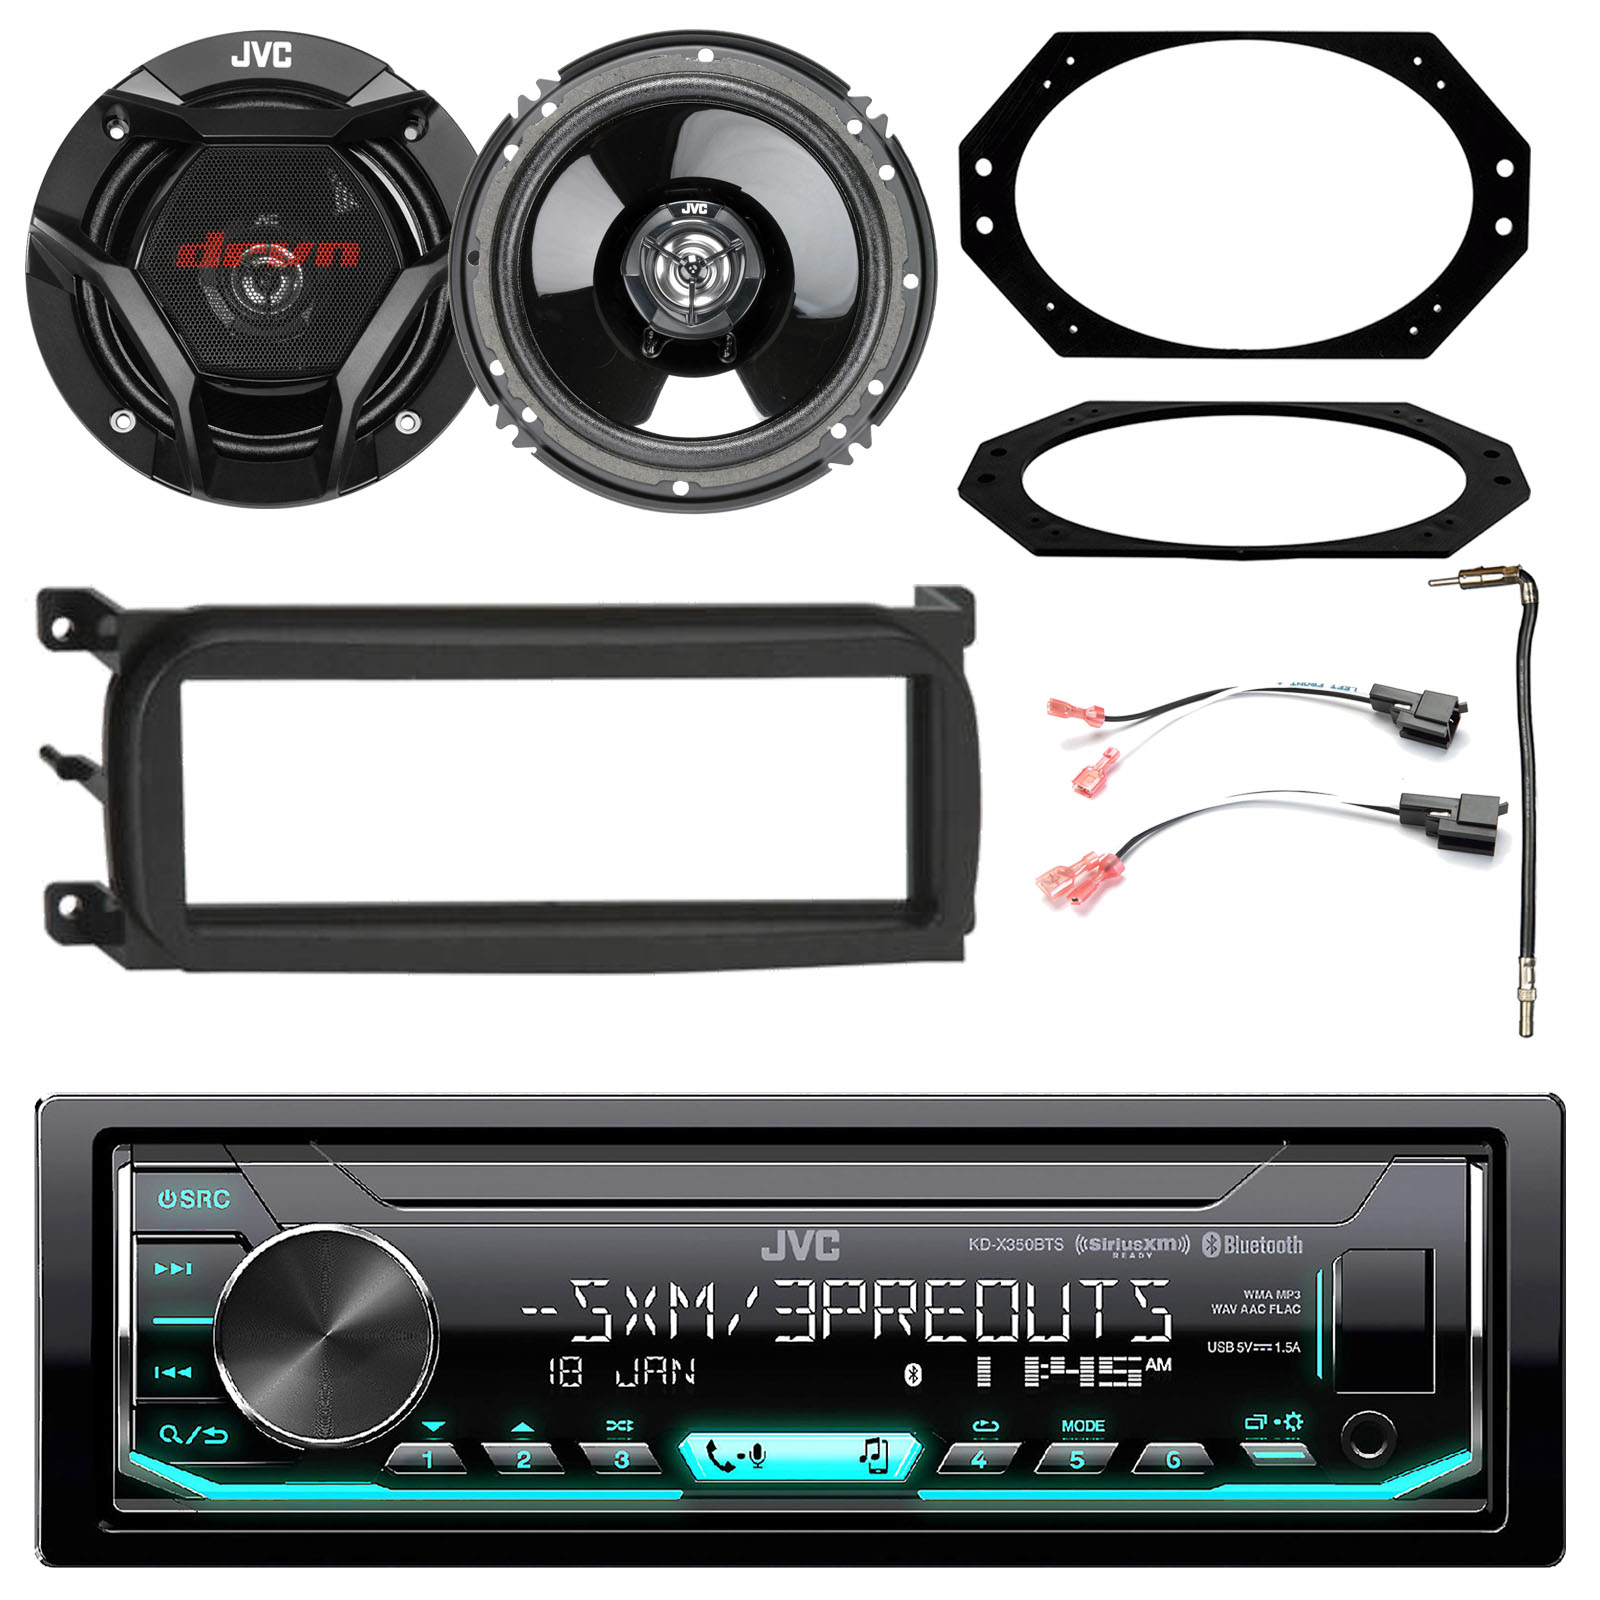 "JVC KD-X350BTS Single-Din Car Digital Media Bluetooth Receiver, USB/AUX/SiriusXM, Single-DIN Dash Kit, Speaker Connector, Antenna Adapter, JVC CS 6.5"" Speakers, 4x6"" Speaker Plate - Select Vehicles"